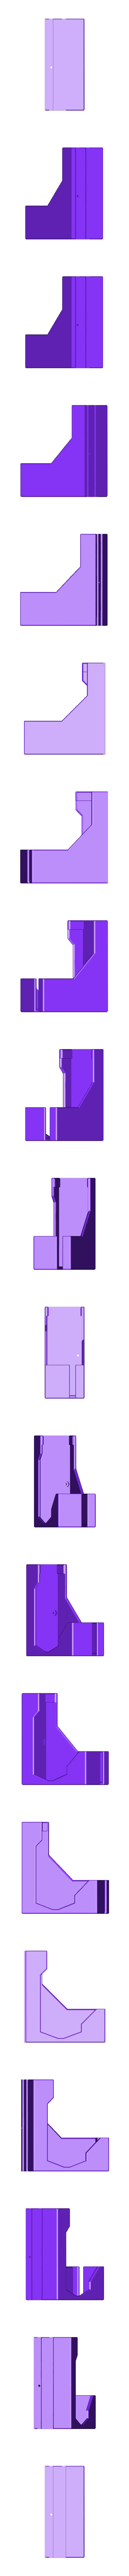 PSU MOUNT SHORT.stl Download free STL file Quick Detachable Ender 3 PSU Power Supply MOUNT • 3D printer object, nrnathan